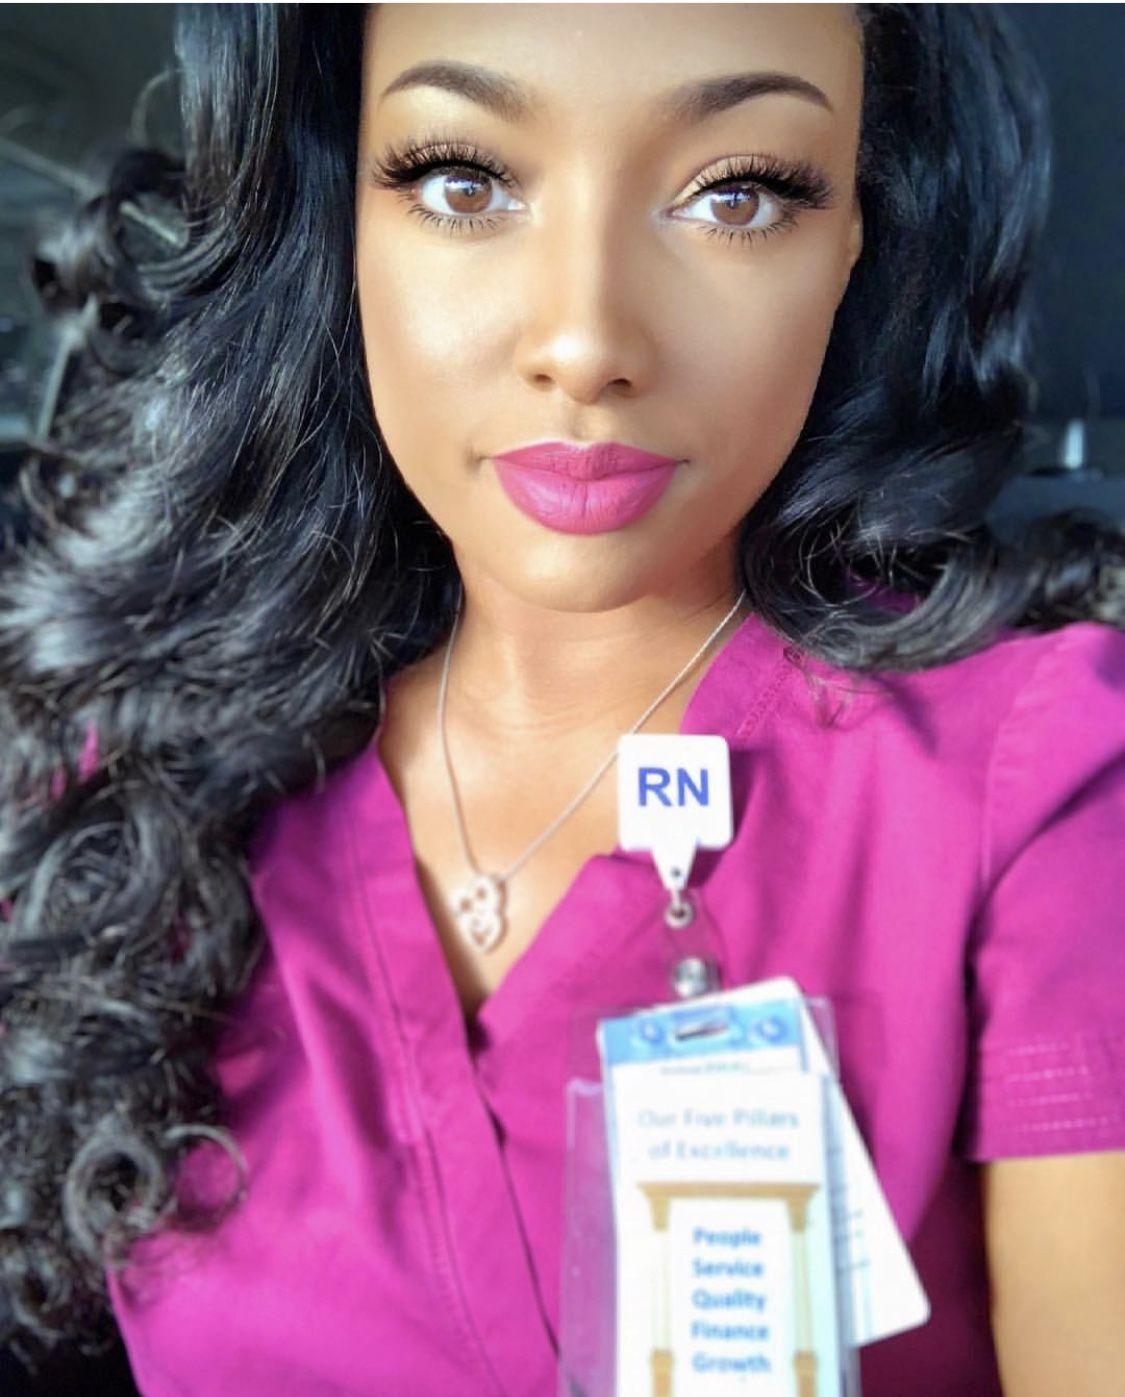 Pin By Lesa Bernacet On Rn Life Nurse Outfit Scrubs Scrub Style Beautiful Nurse